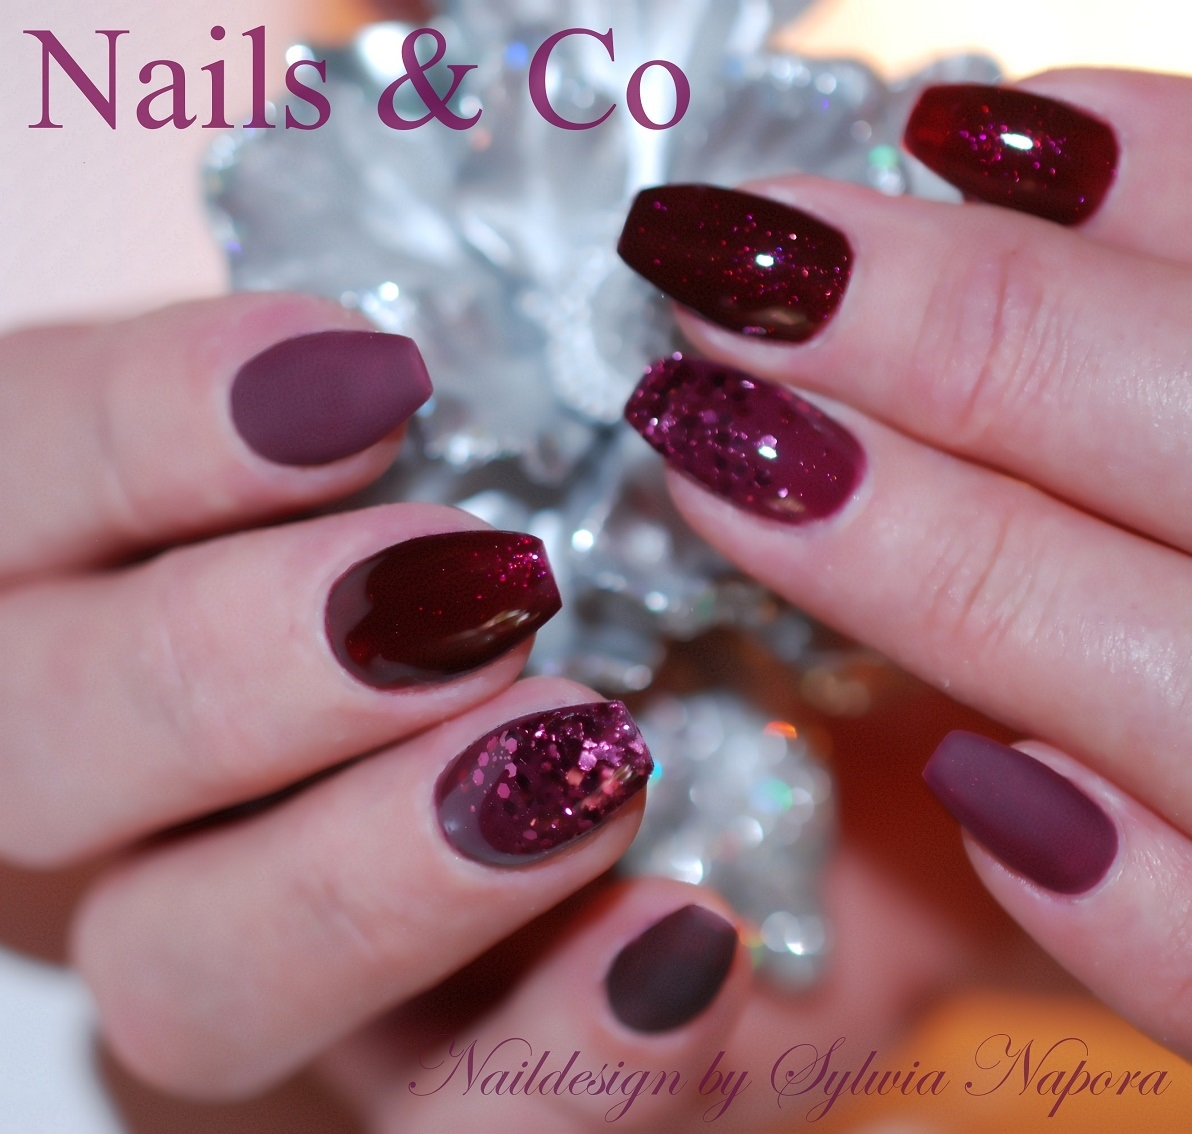 Nailzini A Nail Art Blog: Nail Art Blog Deutsch